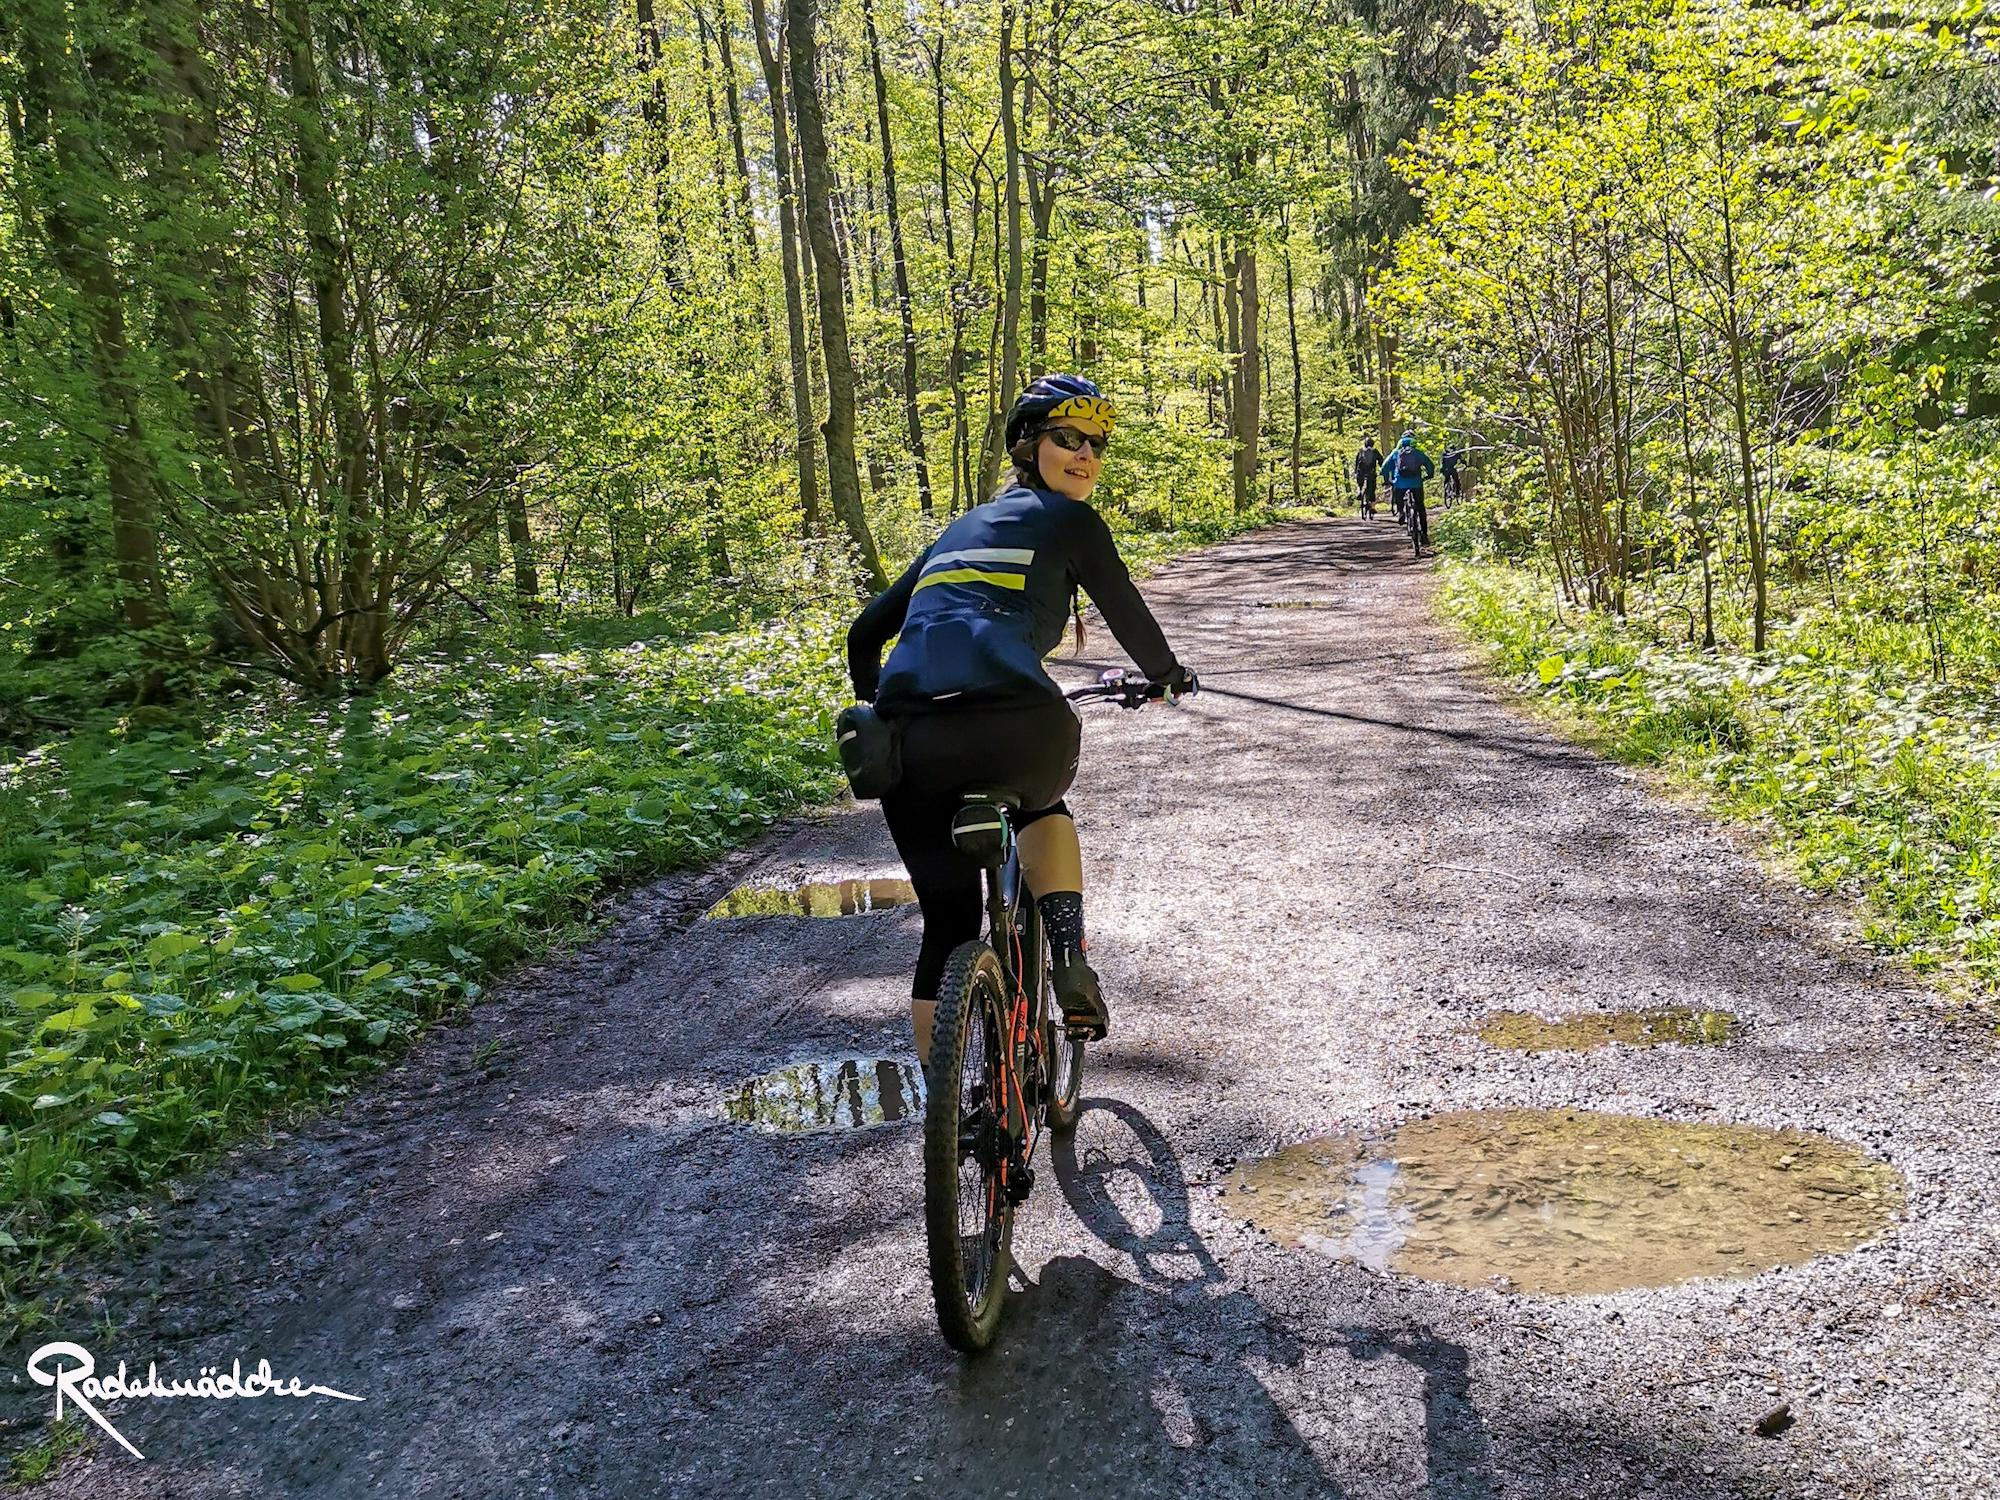 E-MTB-Mountainbike-Harz-Wernigerode-ebike-your-life_Radelmaedchen_Jan-Bubenik-23